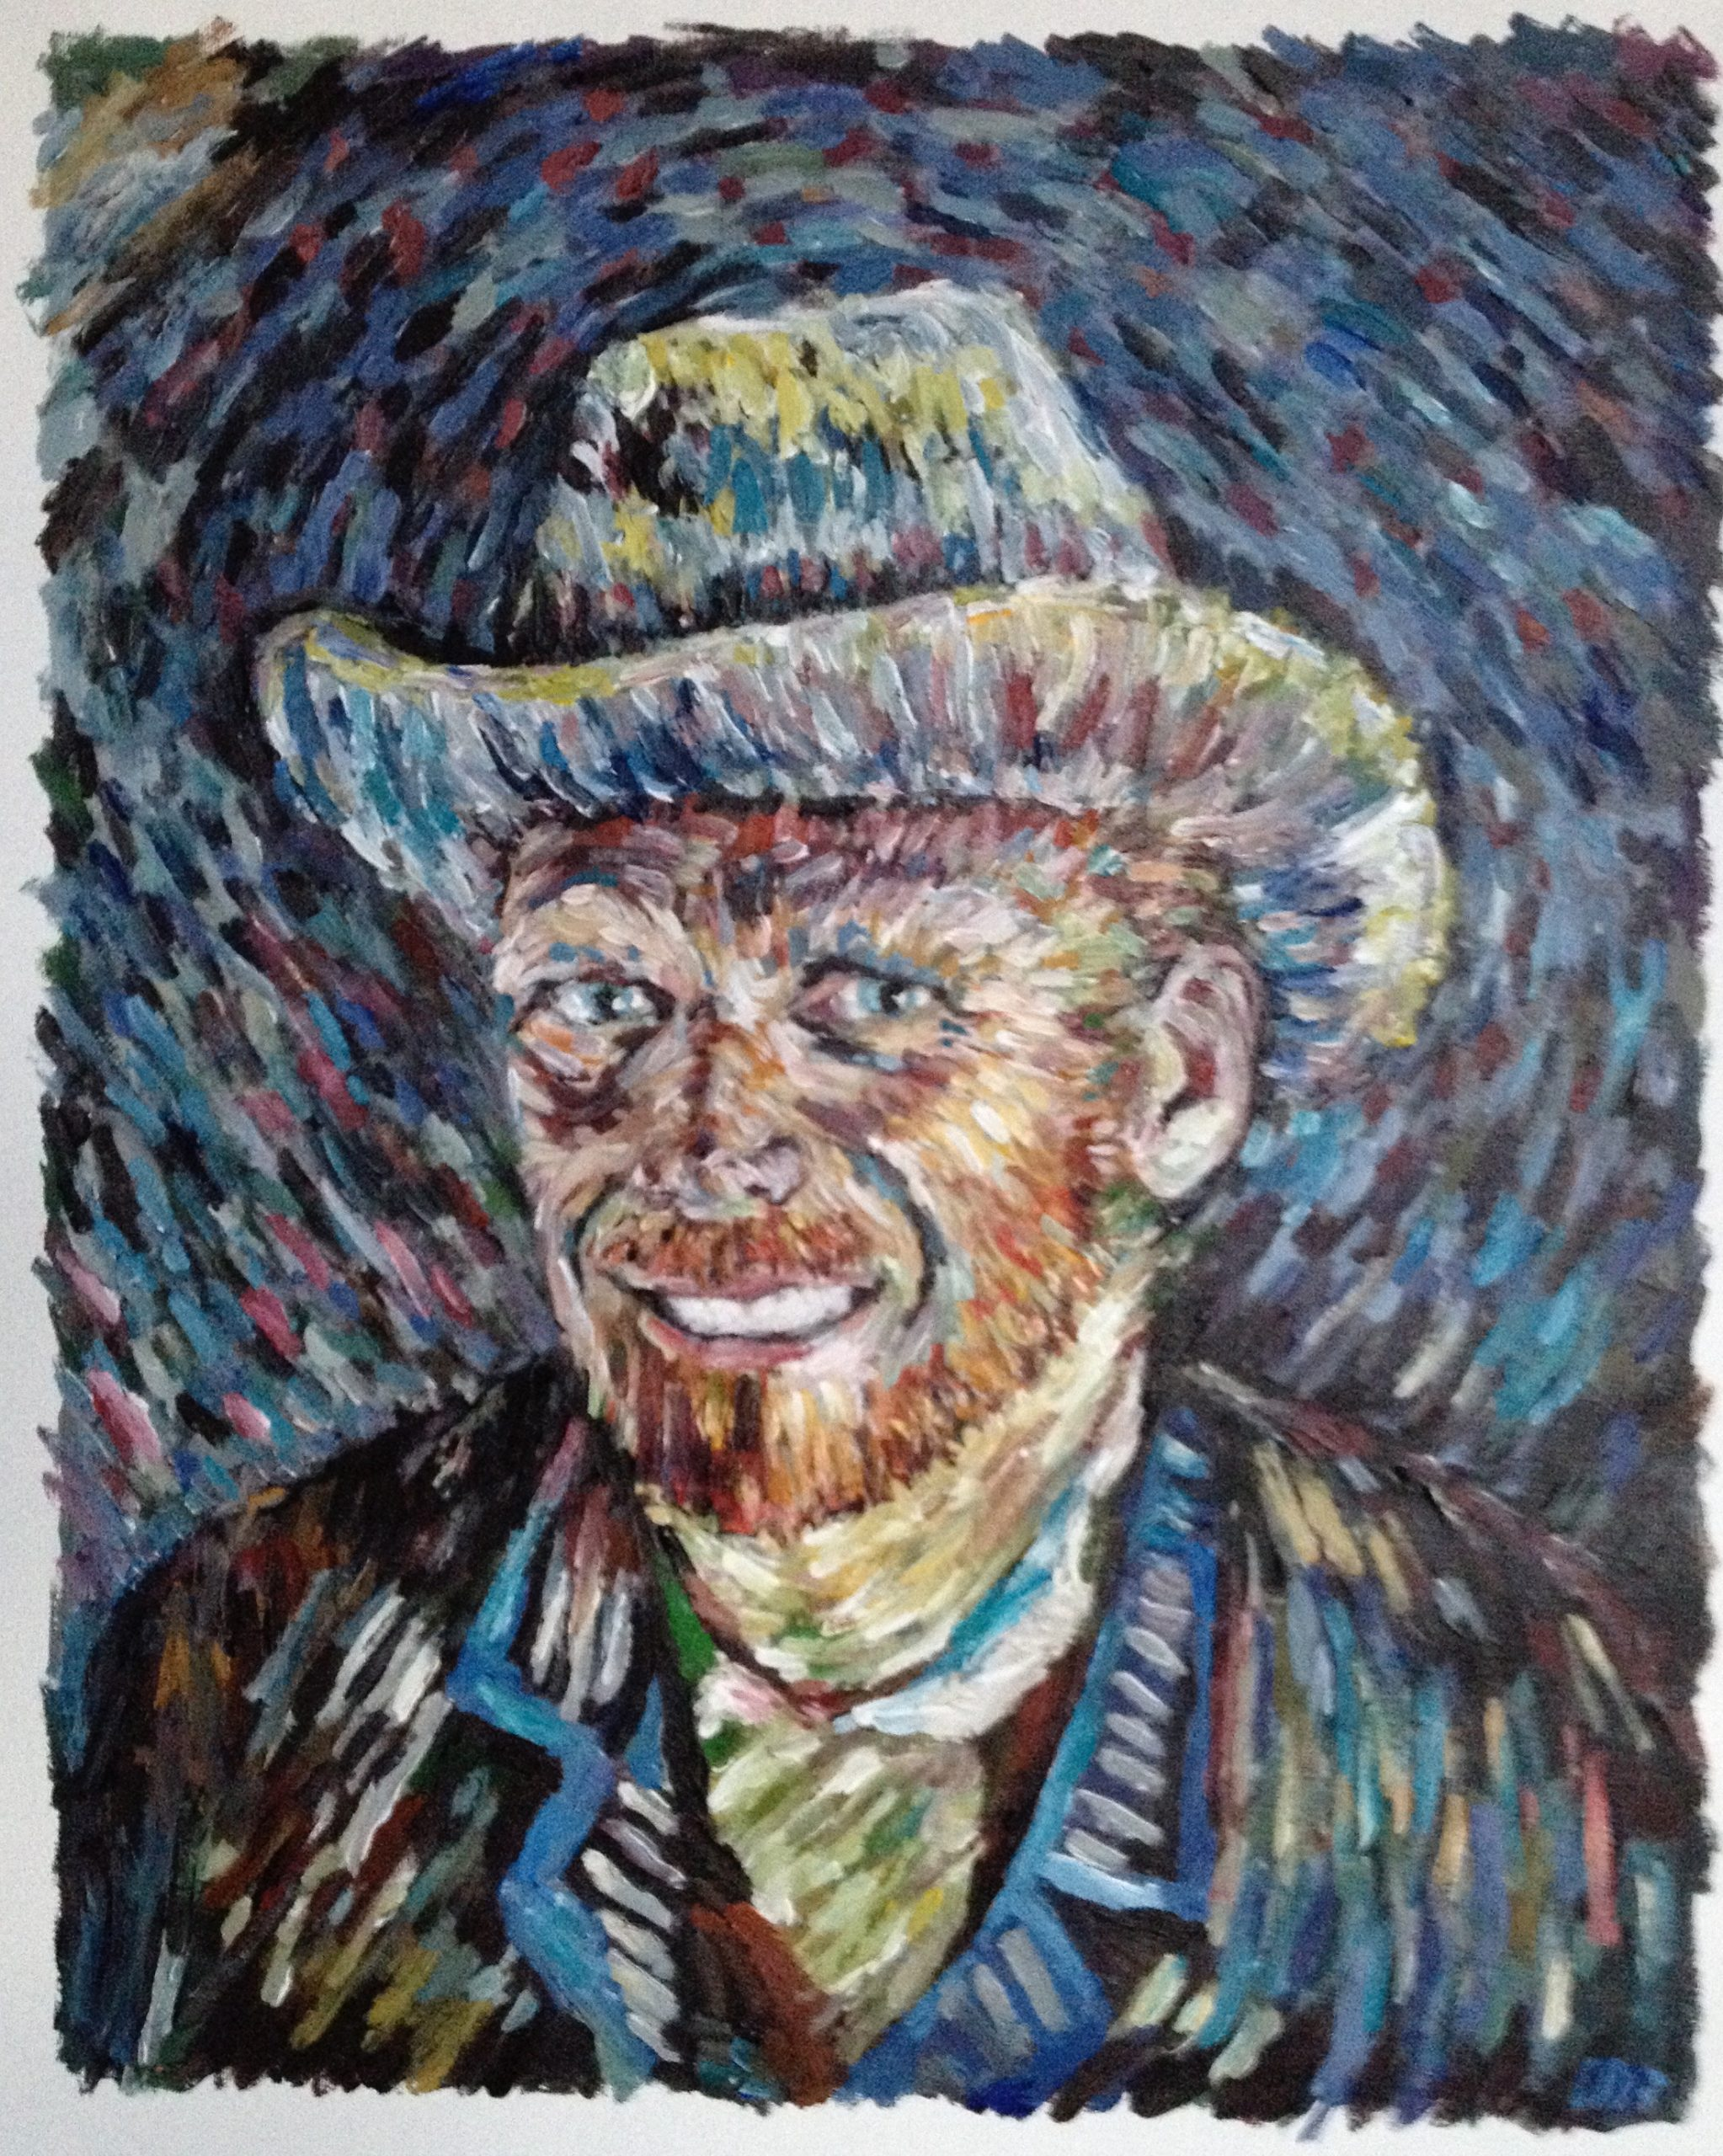 Portrait van Gogh style